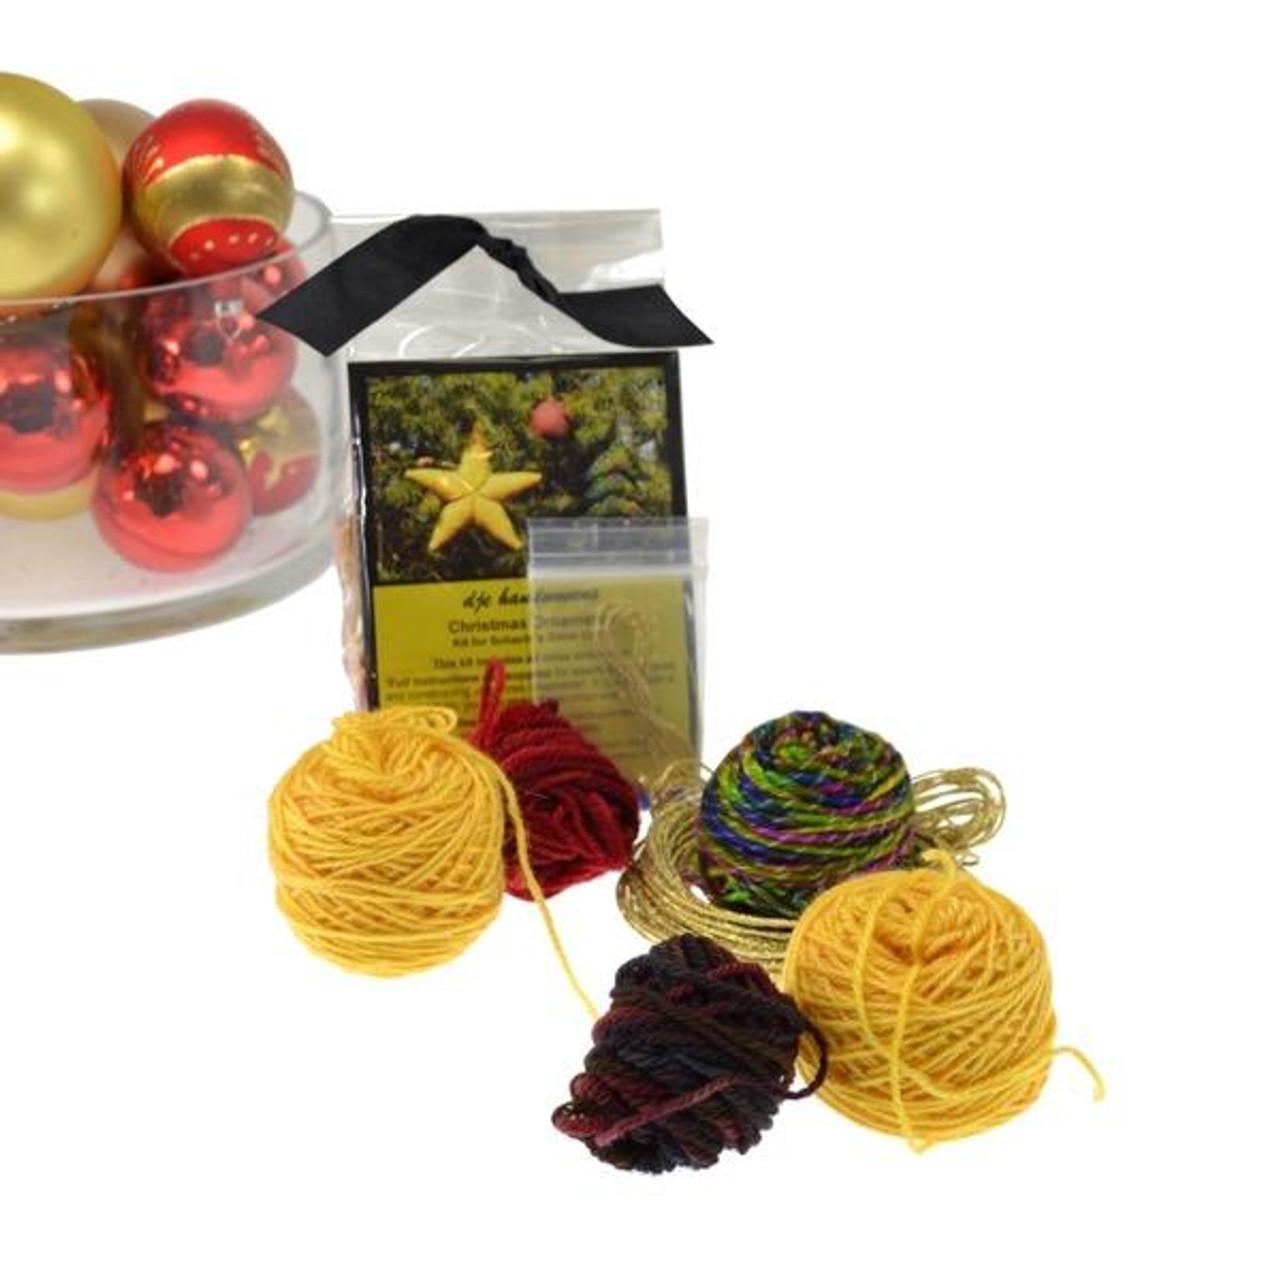 Dje Handwovens Christmas Ornaments Kit